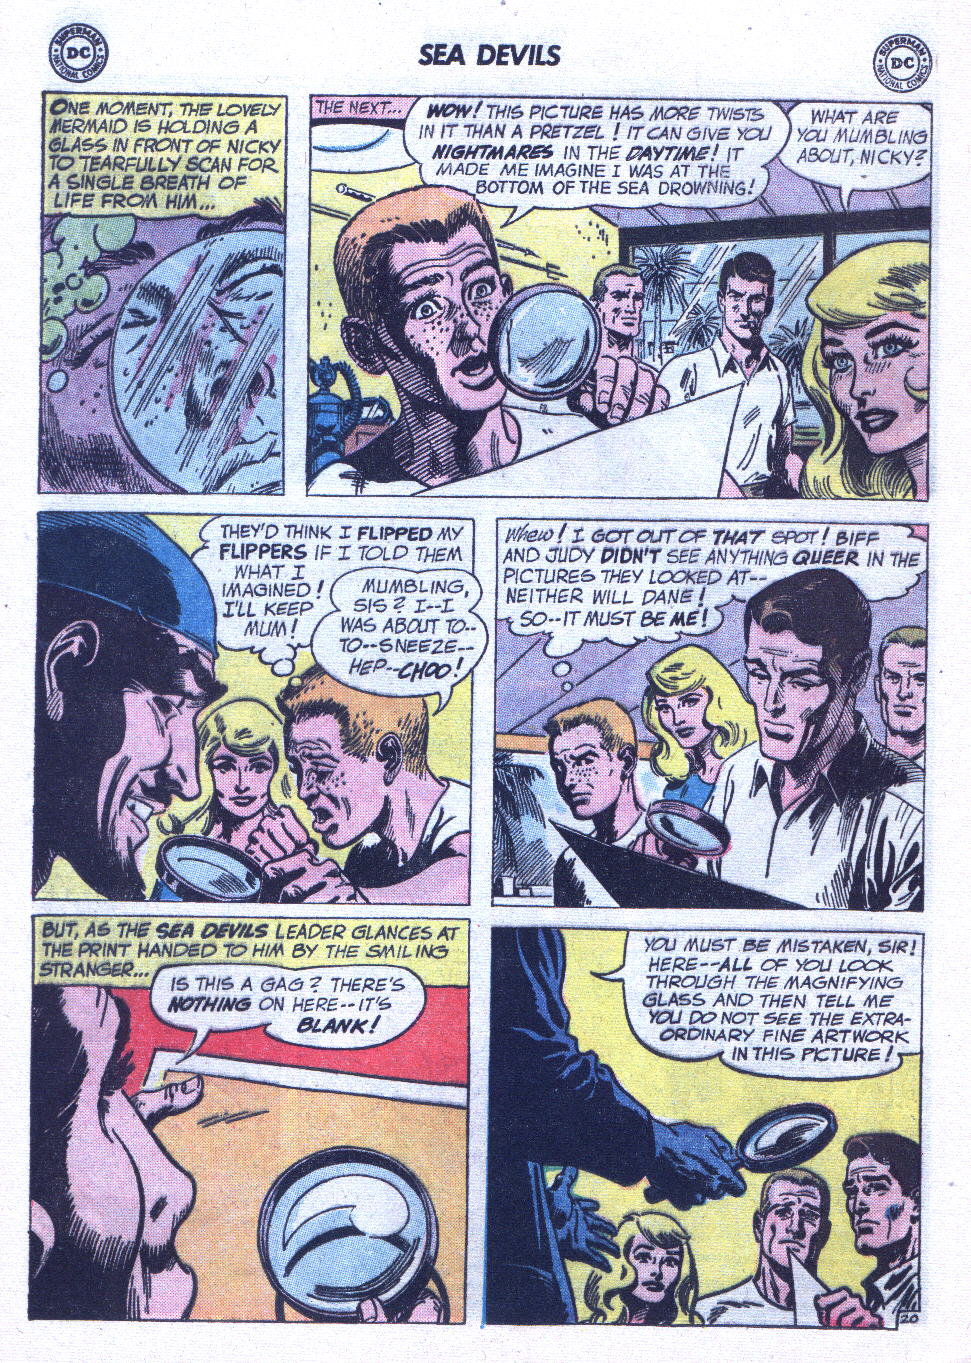 Read online Sea Devils comic -  Issue #6 - 29